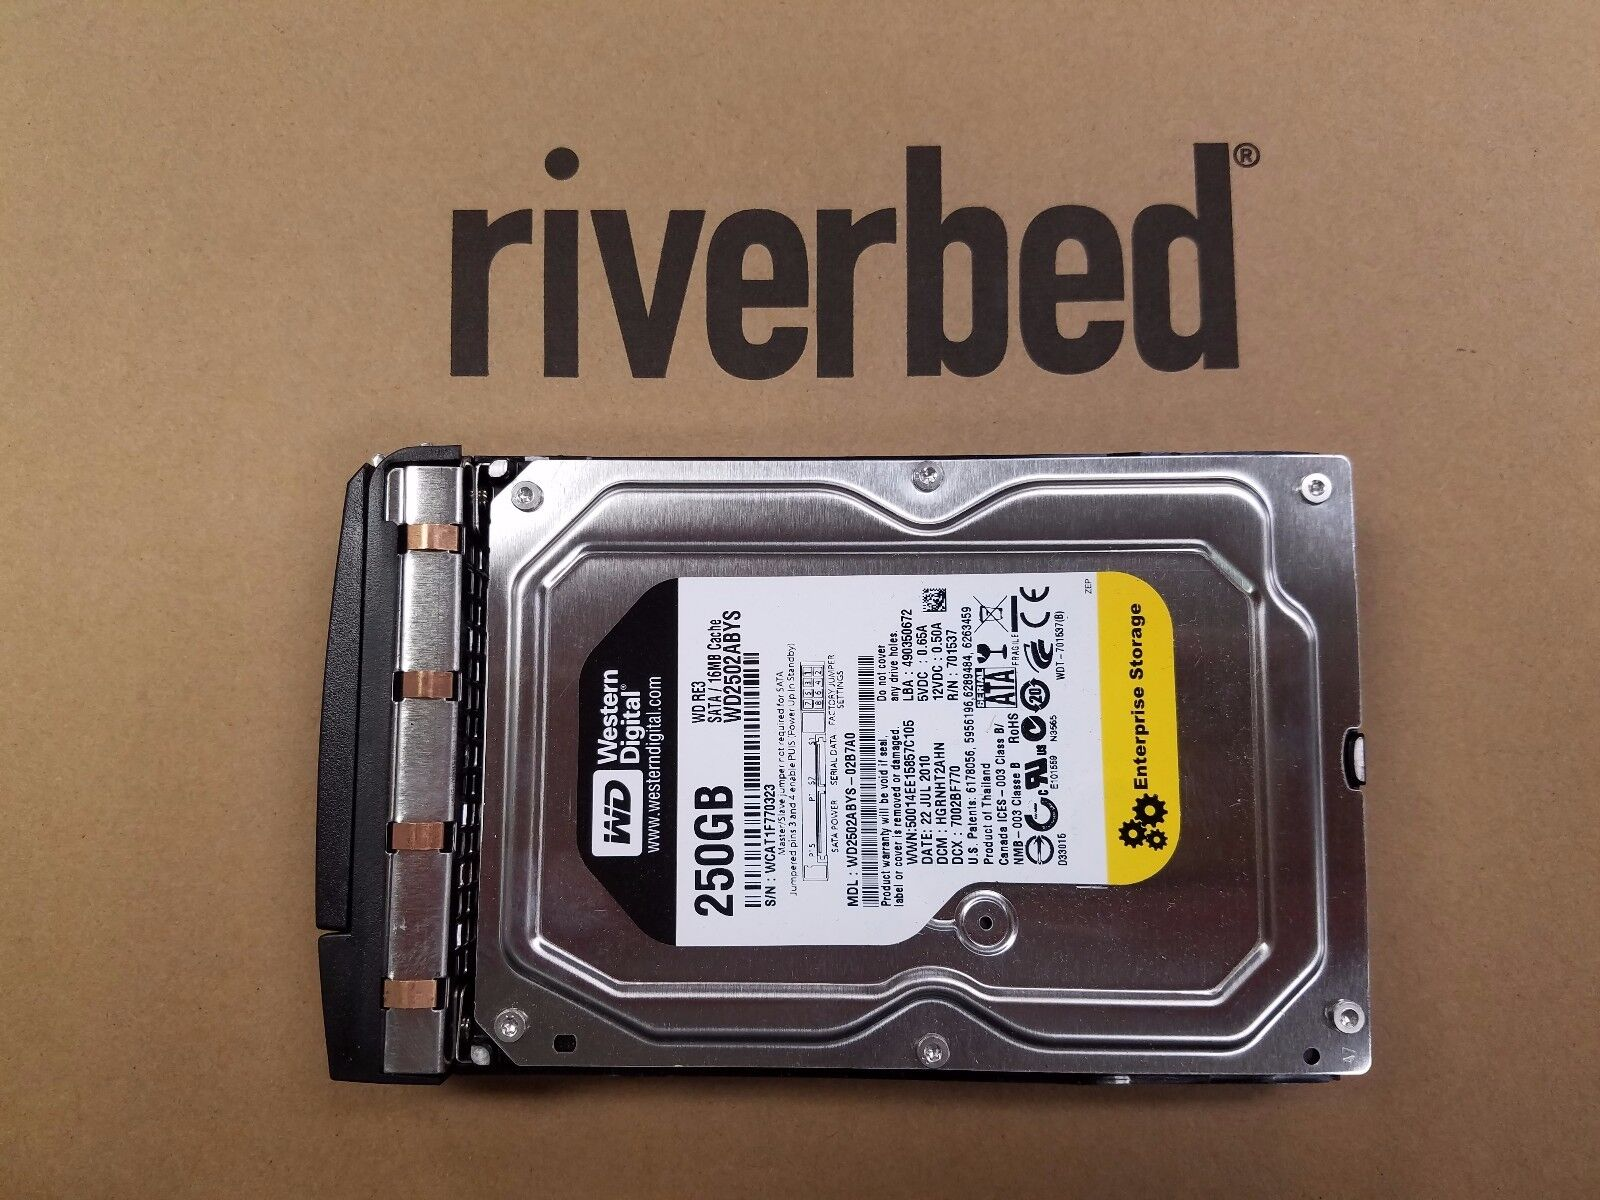 Riverbed Specialists Riverbed Steelhead HDK-250 250GB Riverbed licensed HDD